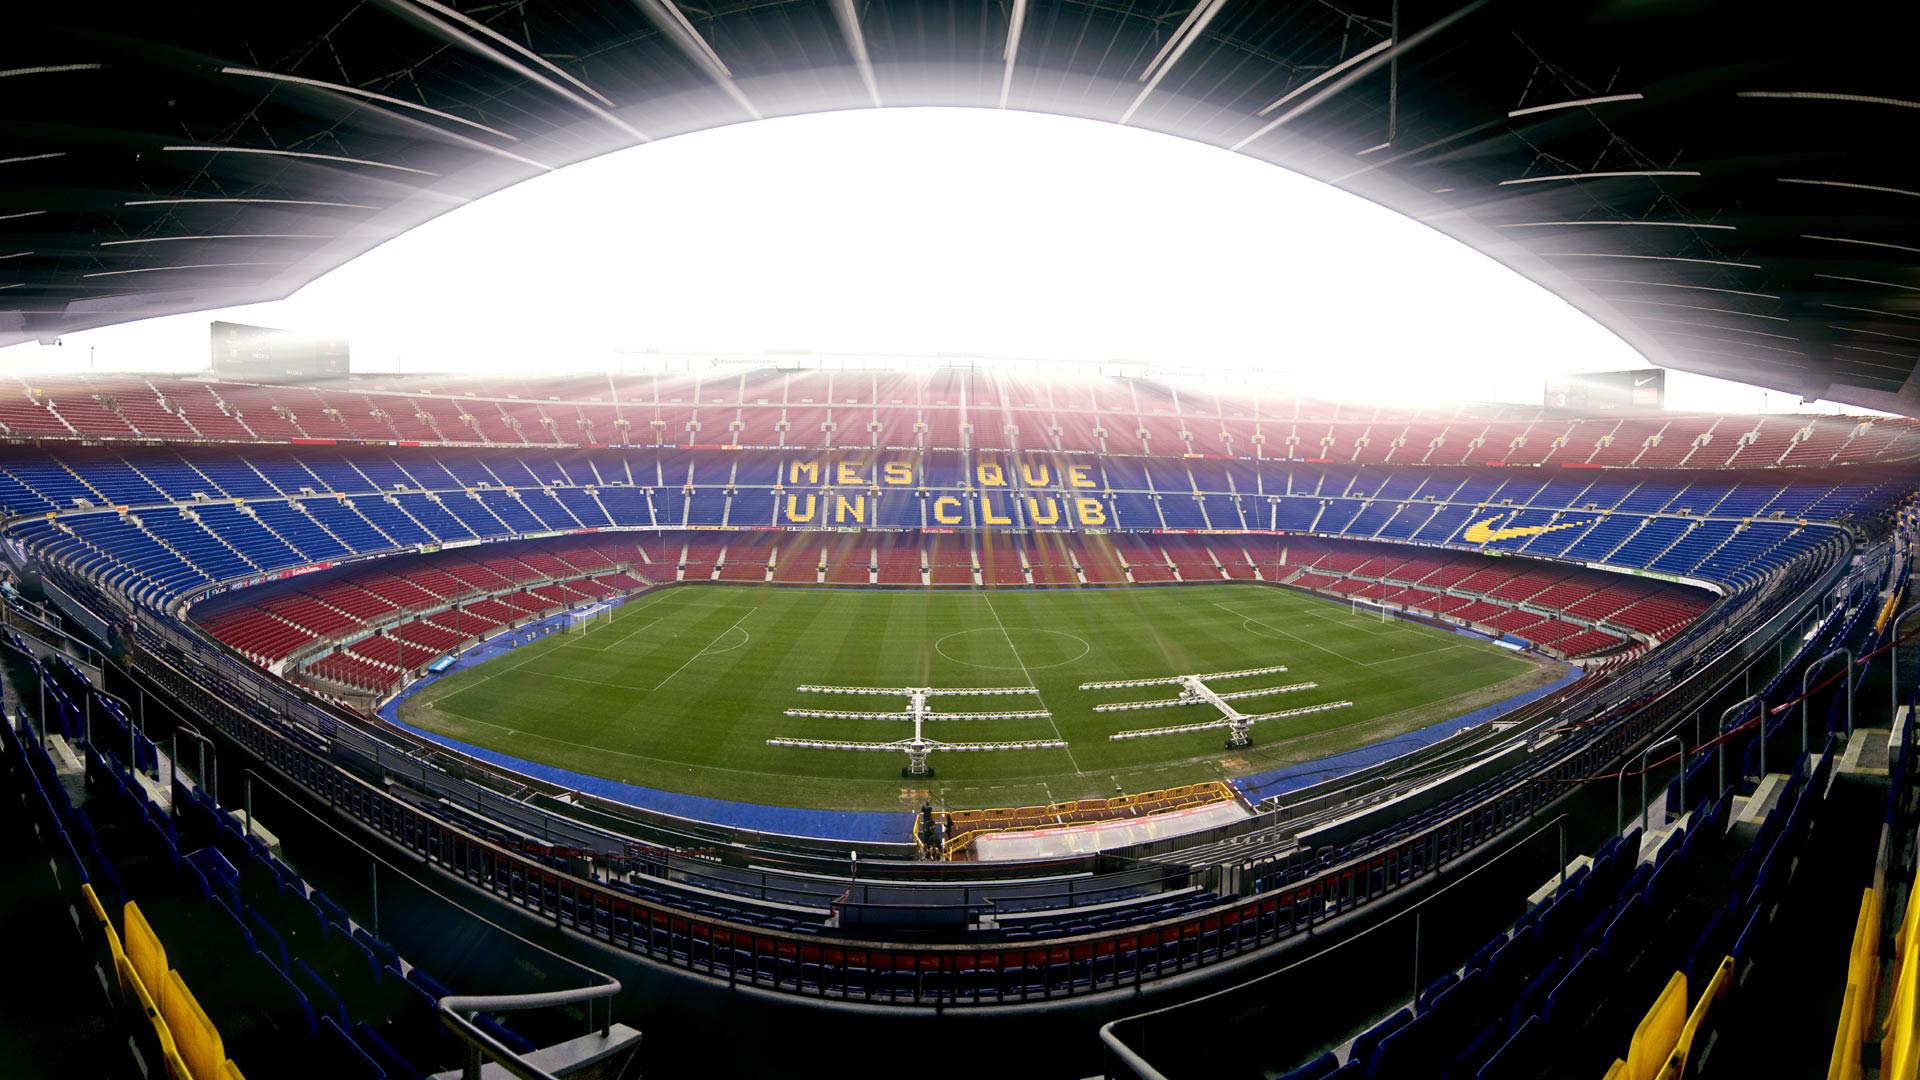 1920x1080 Images For > Fc Barcelona Wallpaper 2015 Logo